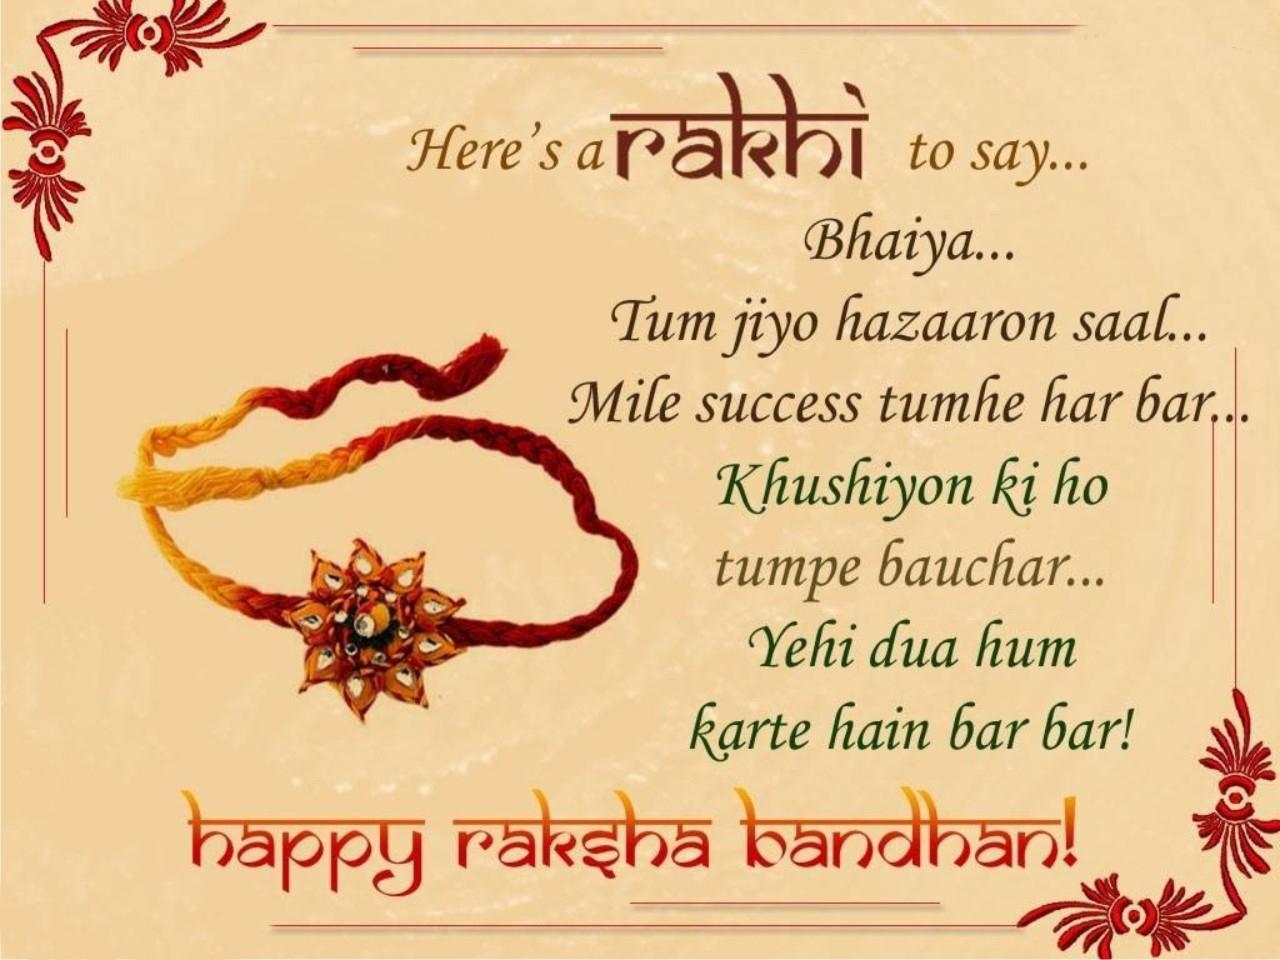 Essay in Hindi On Raksha Bandhan